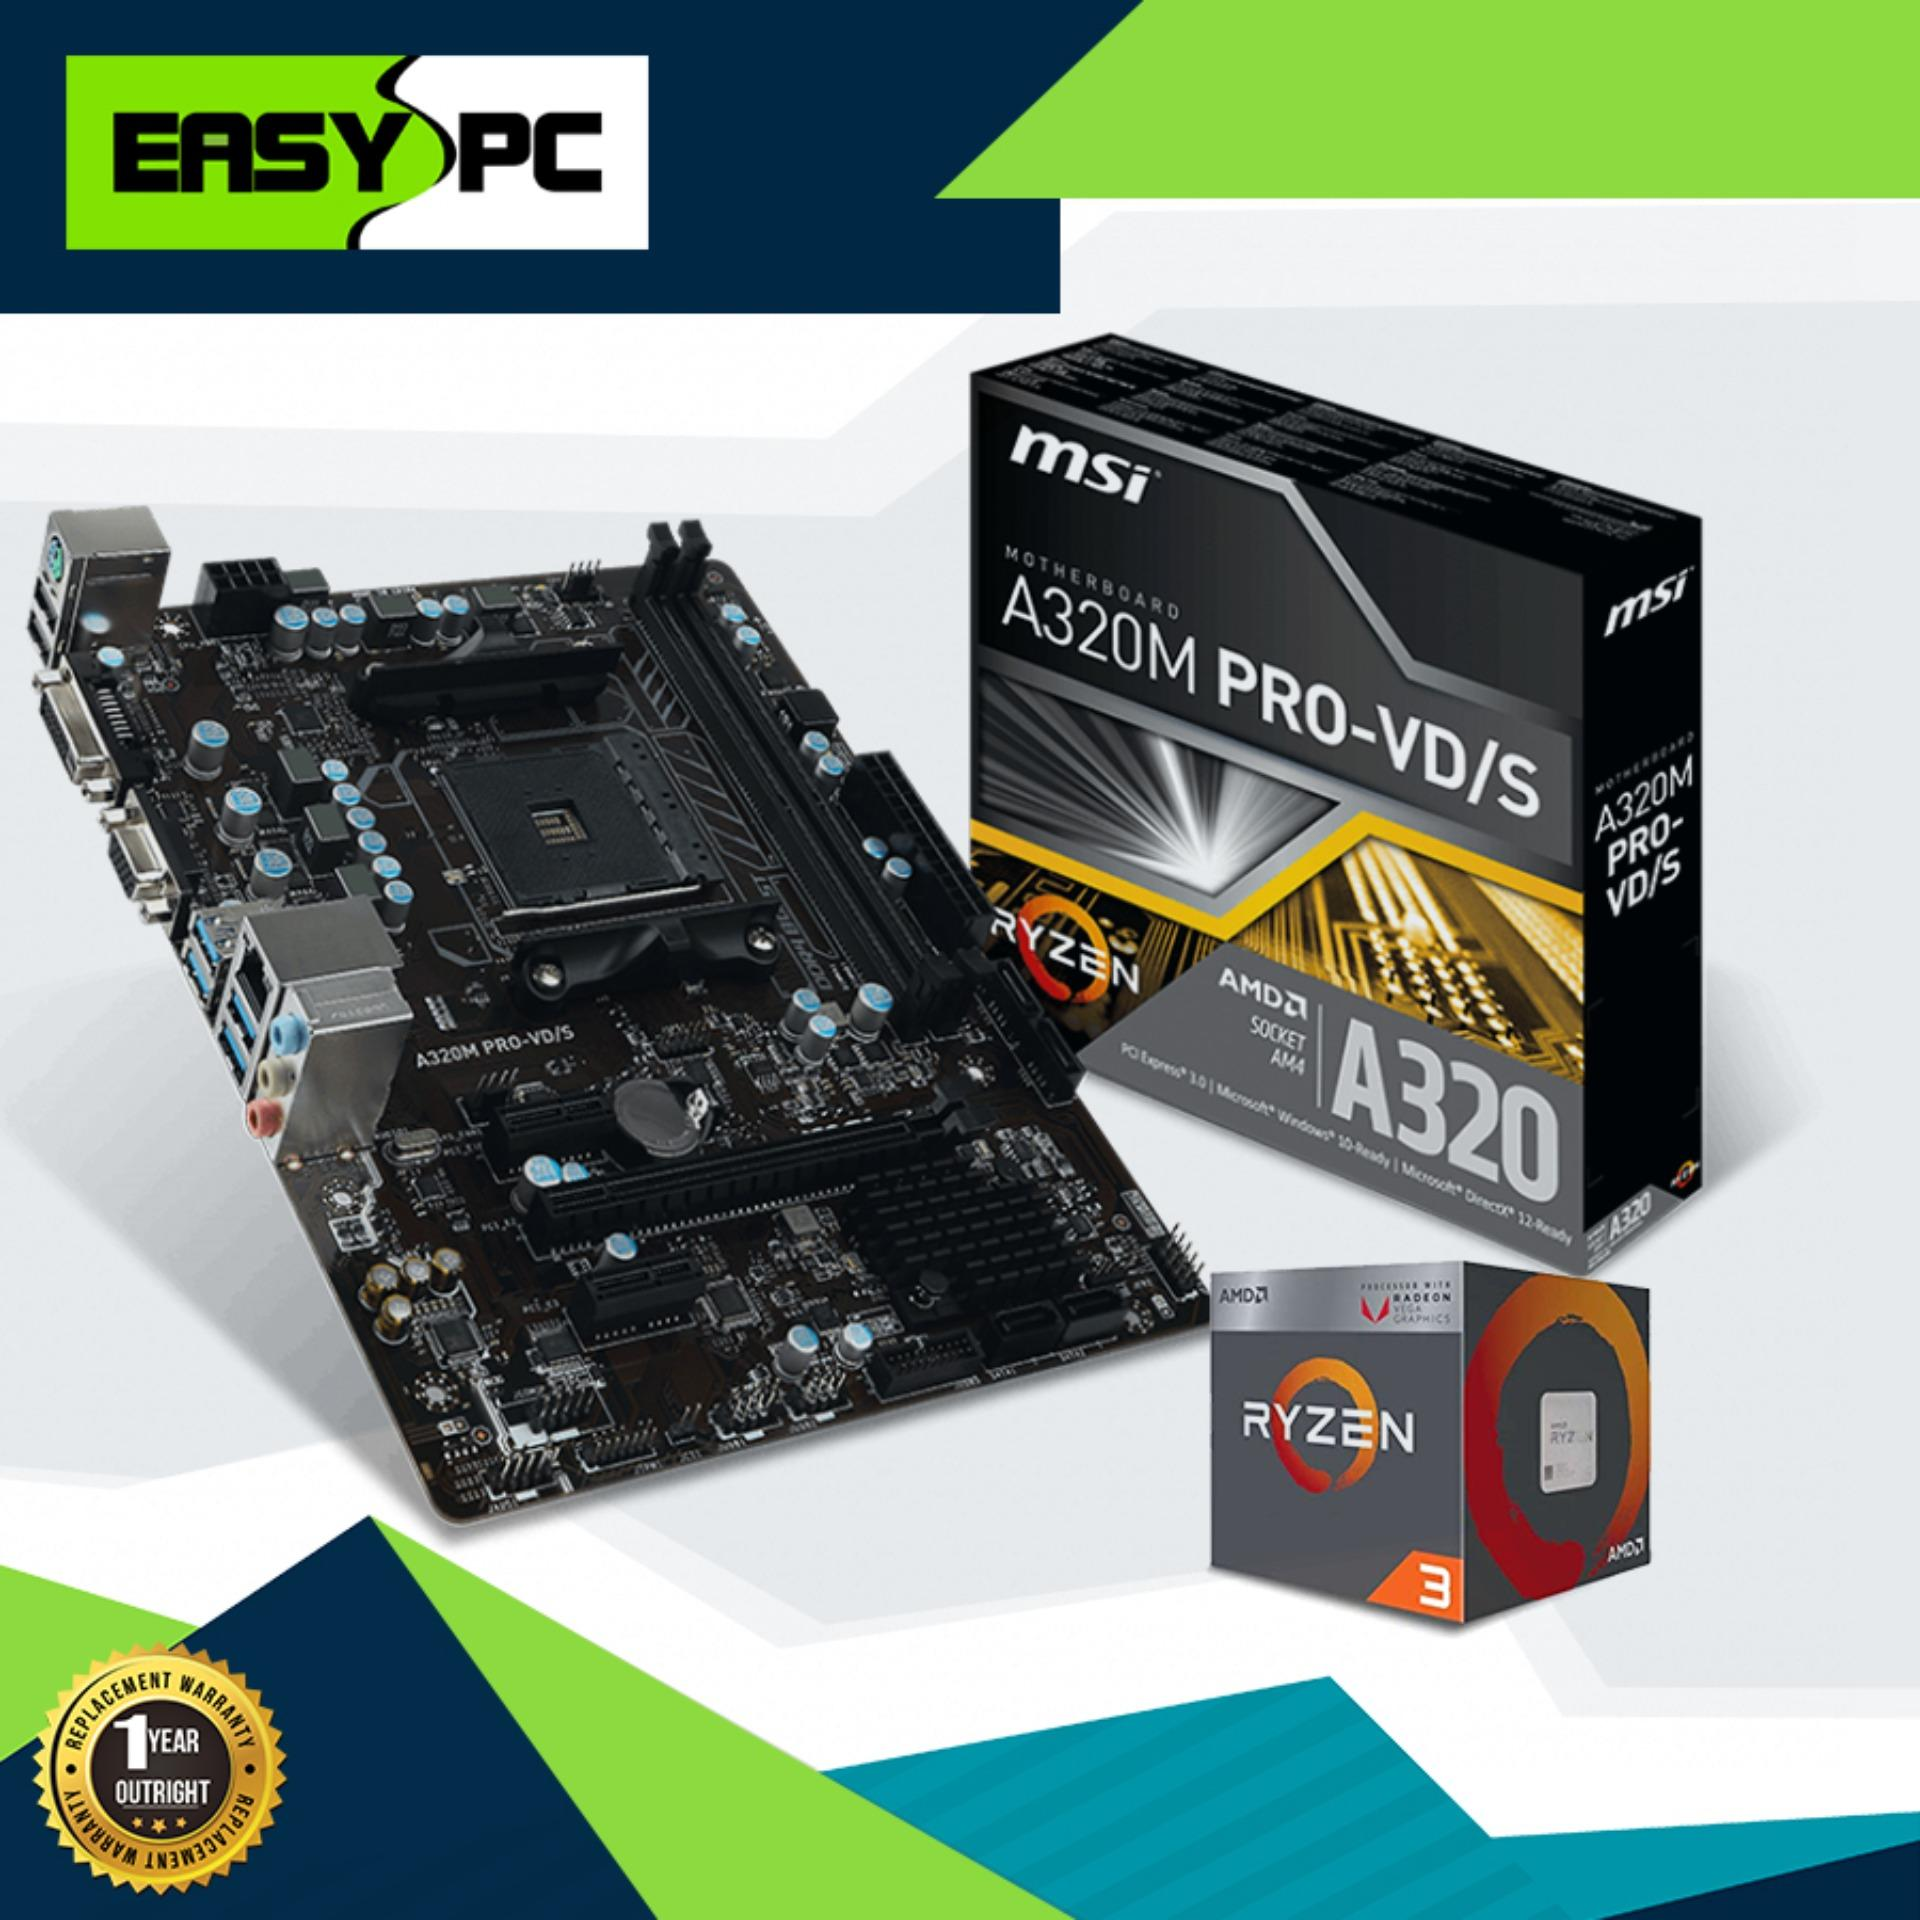 Gaming Desktop Processor and Motherboard Bundle Promo, AMD Processor Ryzen  3 2200G Socket AM4 3 5ghz, Msi A320M Pro-VD/S Motherboard Socket Am4 Pcie